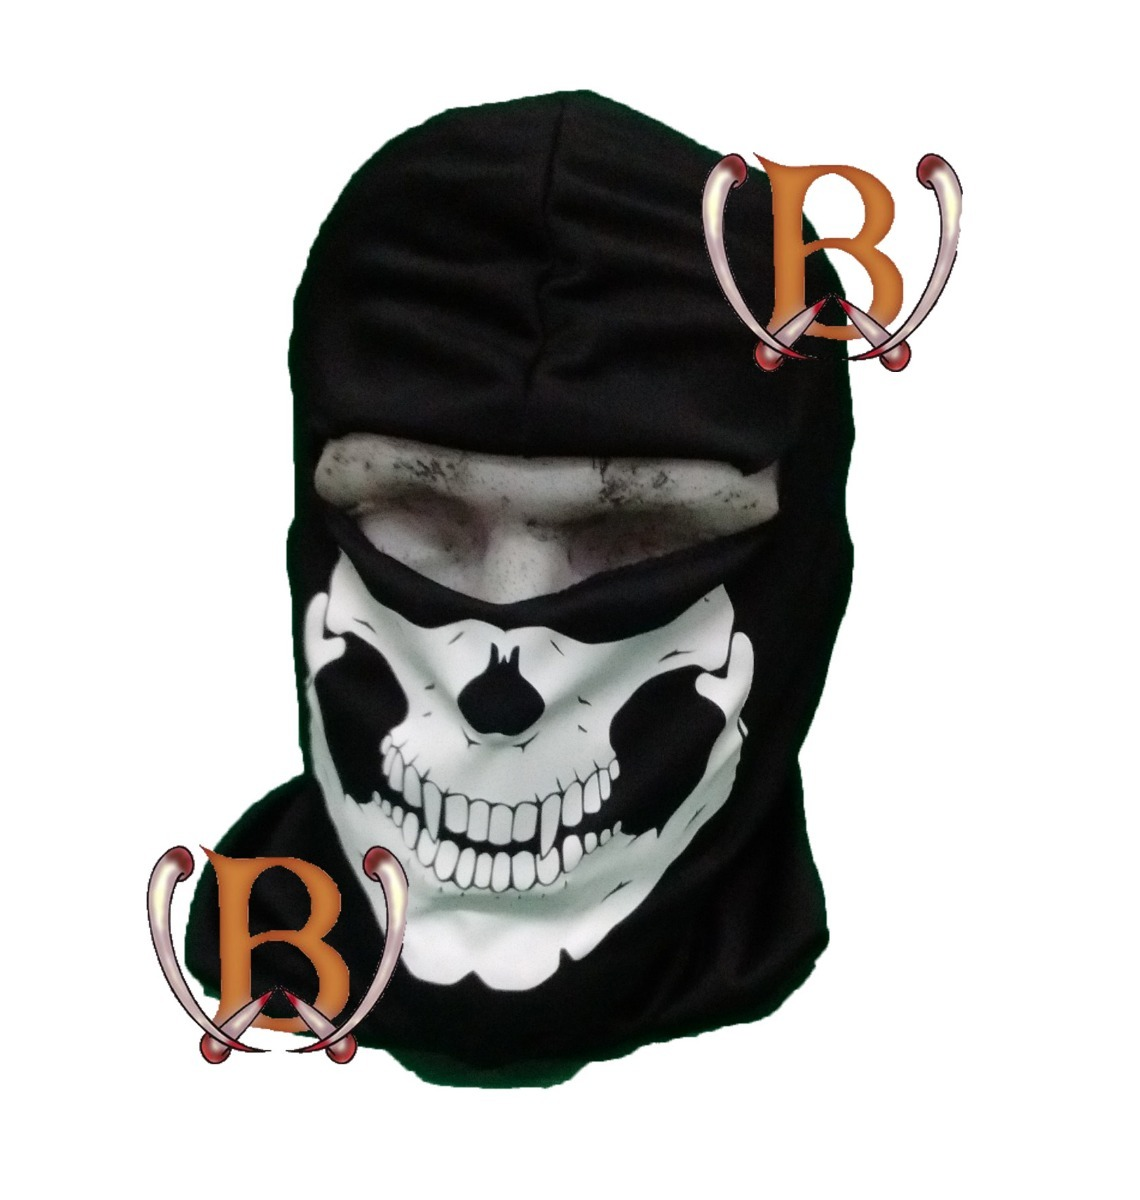 mascara balaclava calavera skull poliester navy seals moto 186